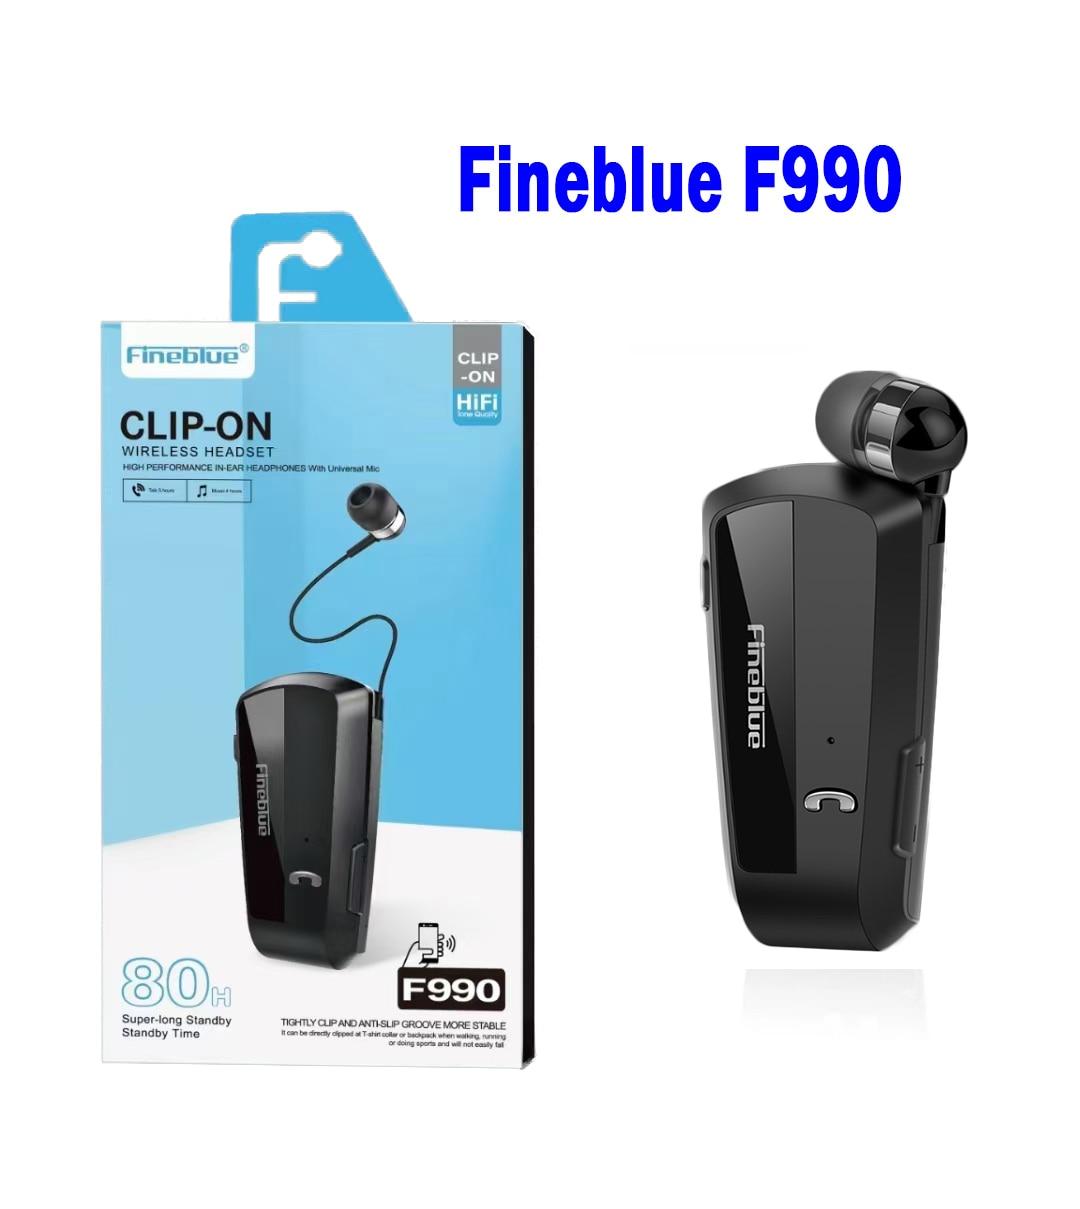 Fineblue F990 Gamera Earphone Wireless business Bluetooth Headset V5.0 Sport Driver headphone Clip on stereo earbud Vibration